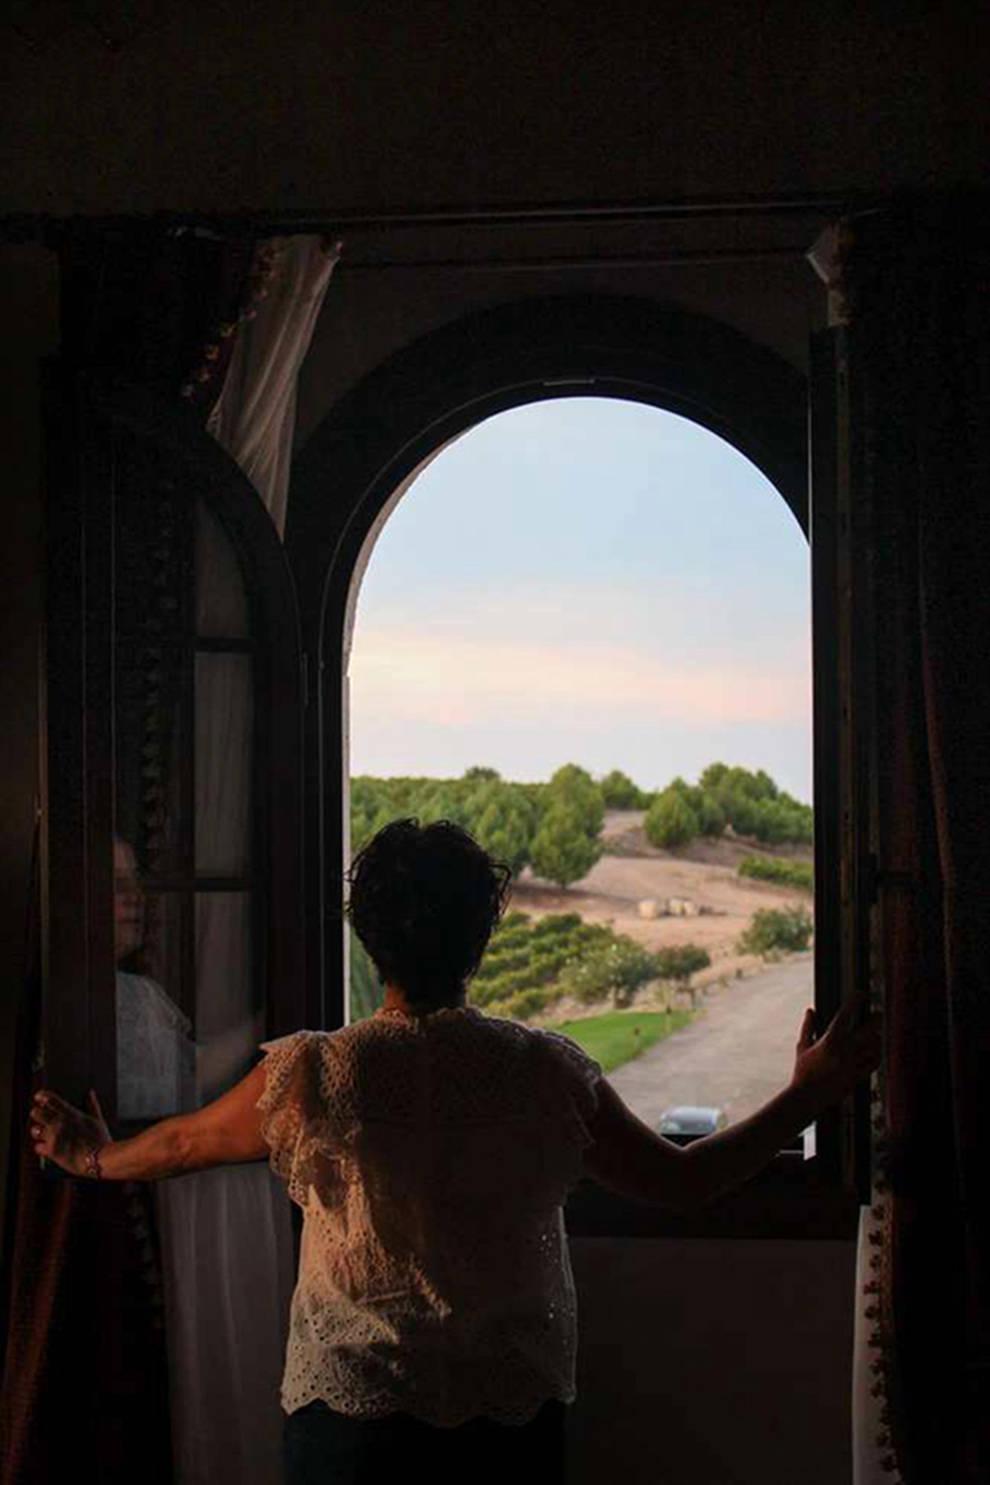 Raquel Apastegui gana el reto Ventanas de Fototuitribera